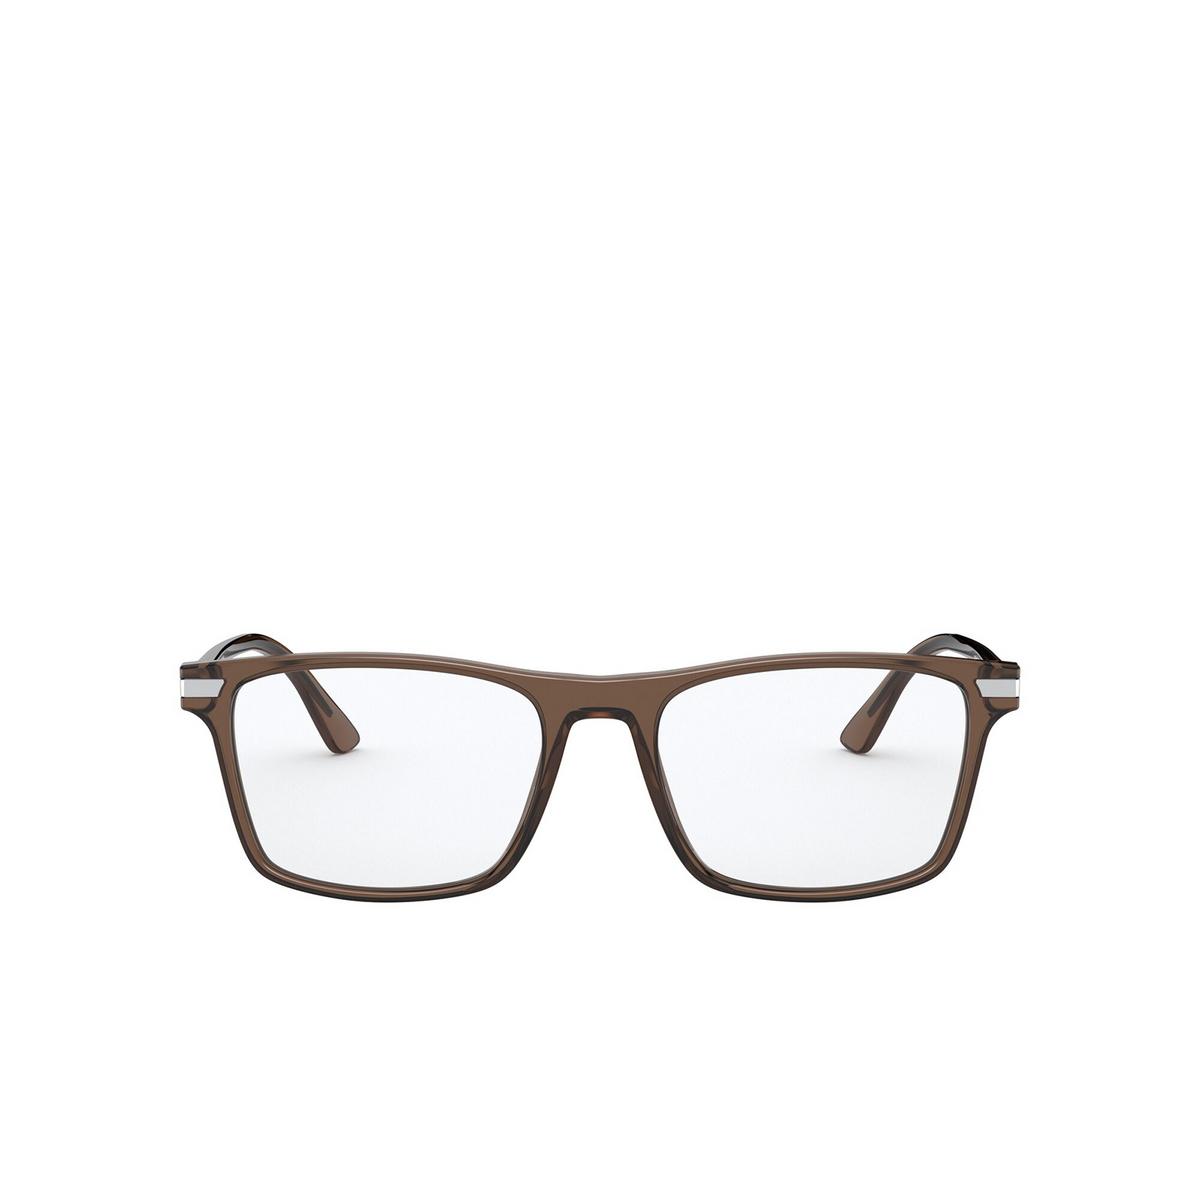 Prada® Rectangle Eyeglasses: PR 01WV color Brown 09F1O1 - front view.